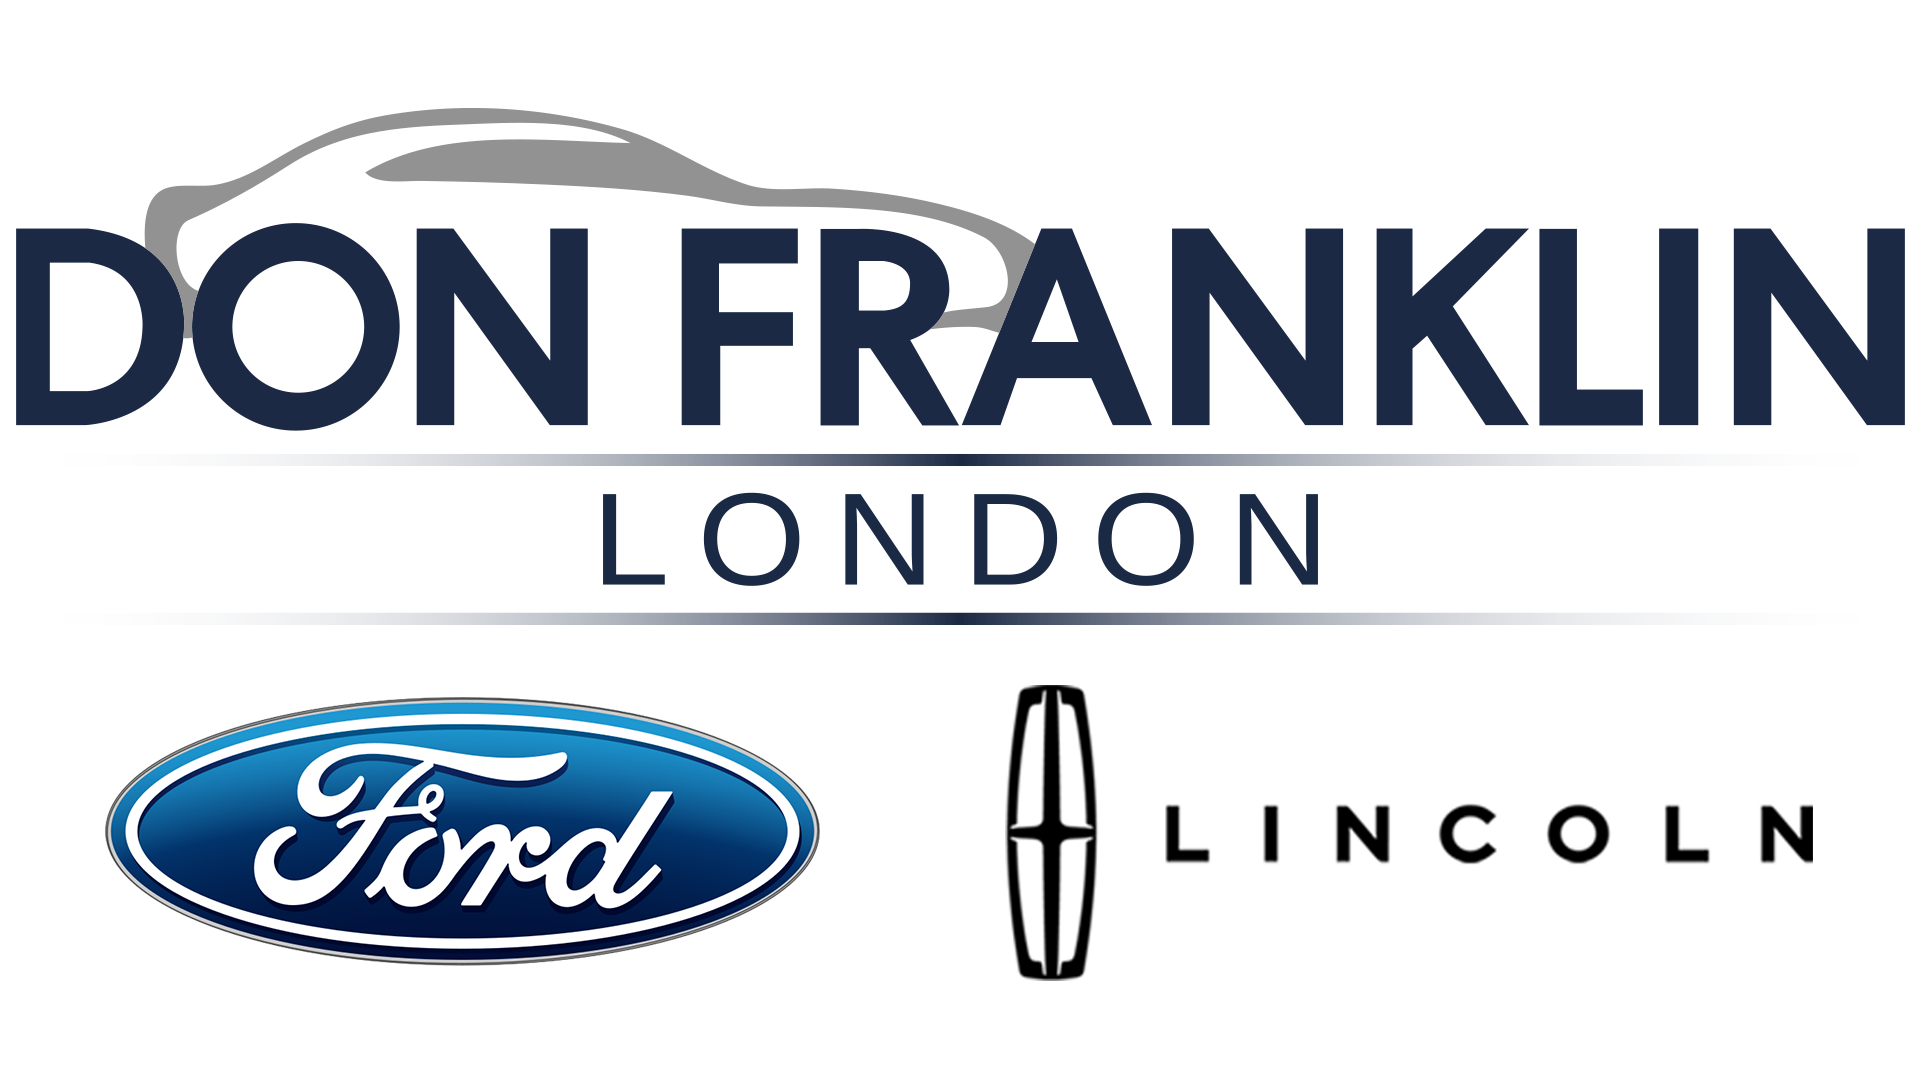 LOND-FordLincoln